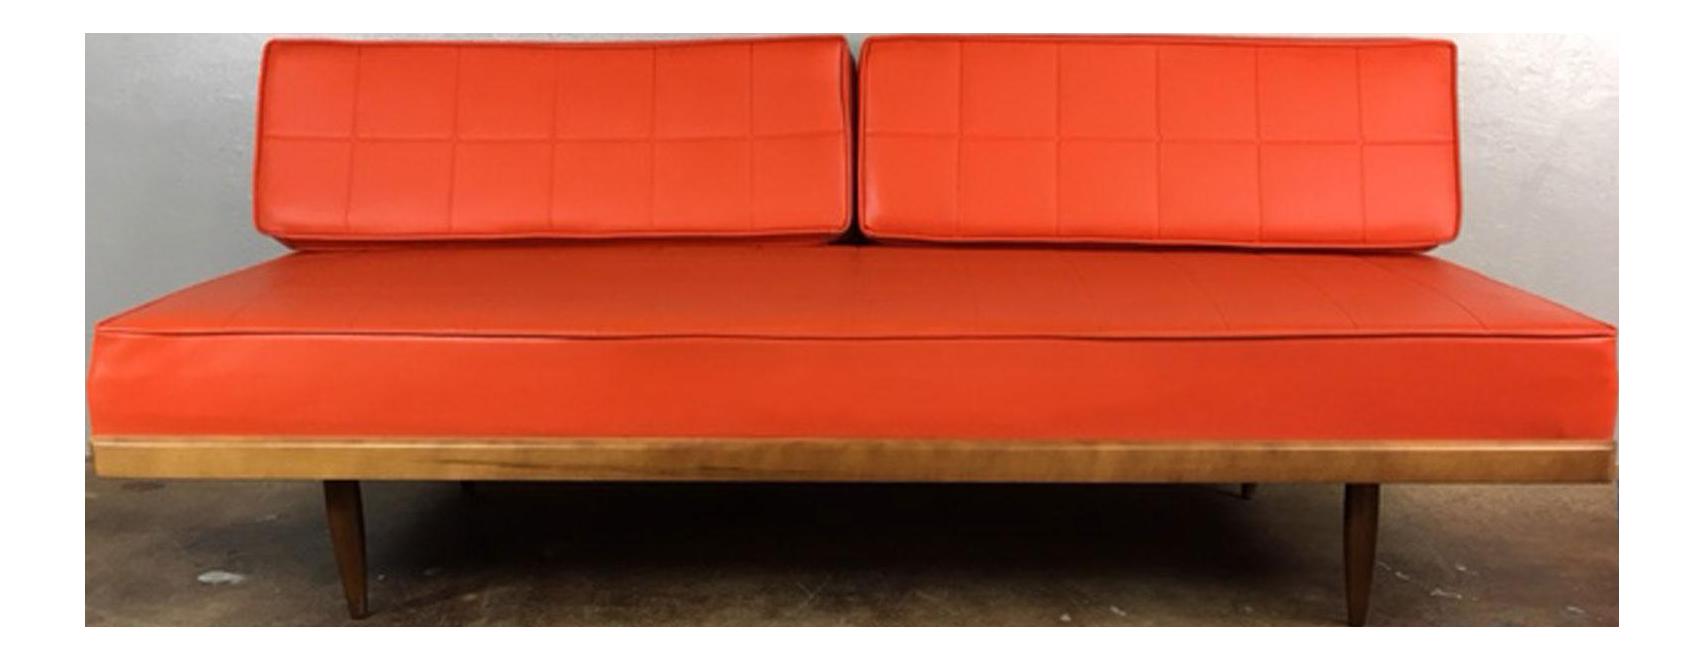 midcentury modern orange daybed